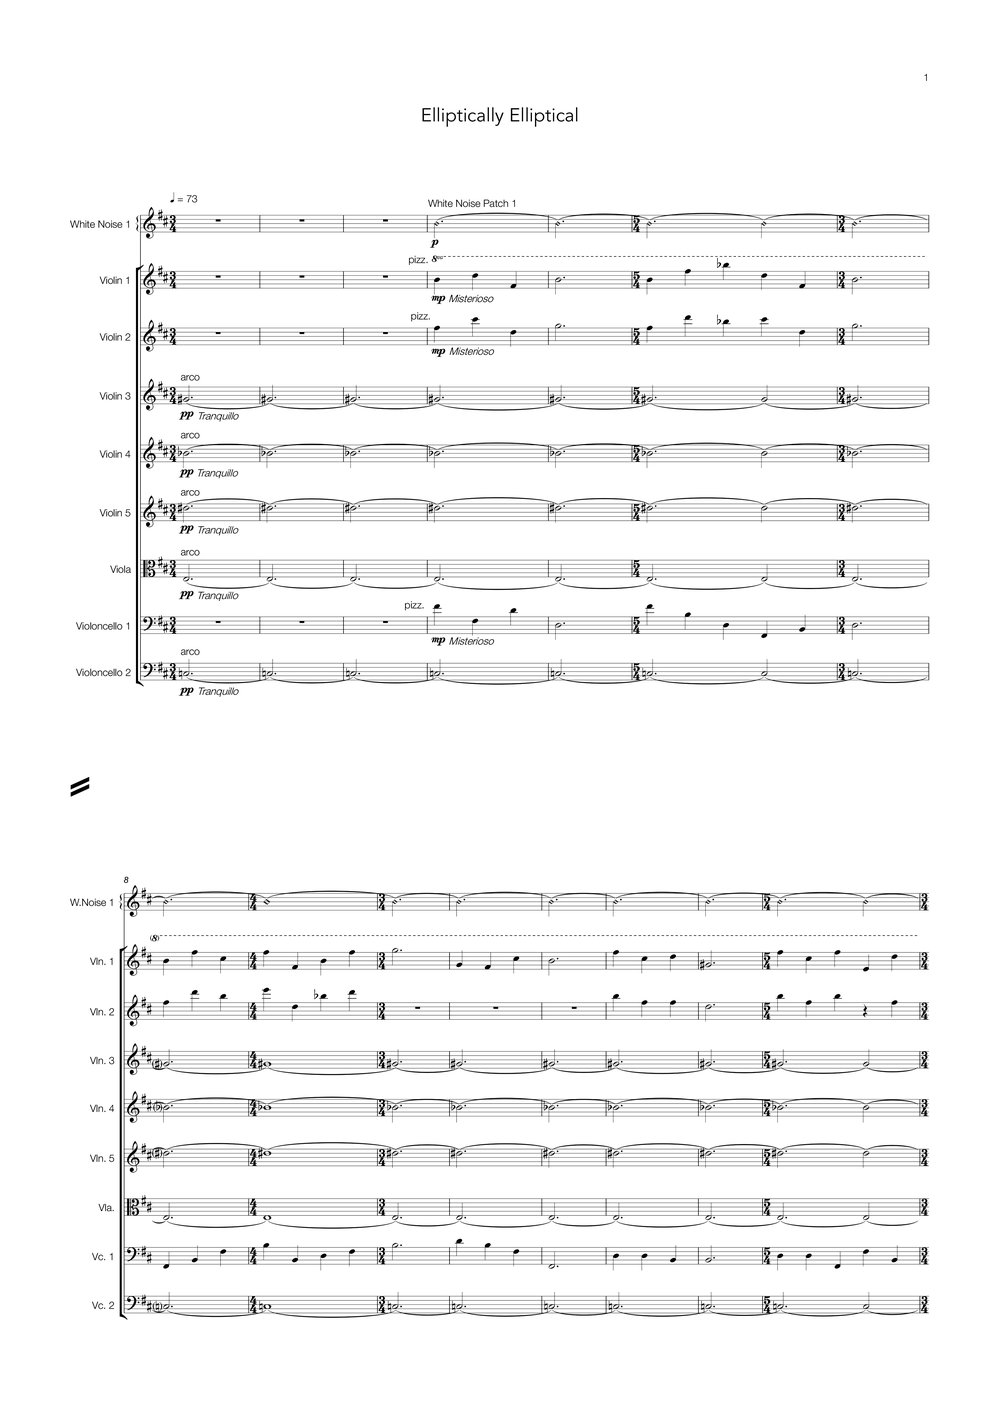 Elliptically Elliptical Score Page 3.jpg